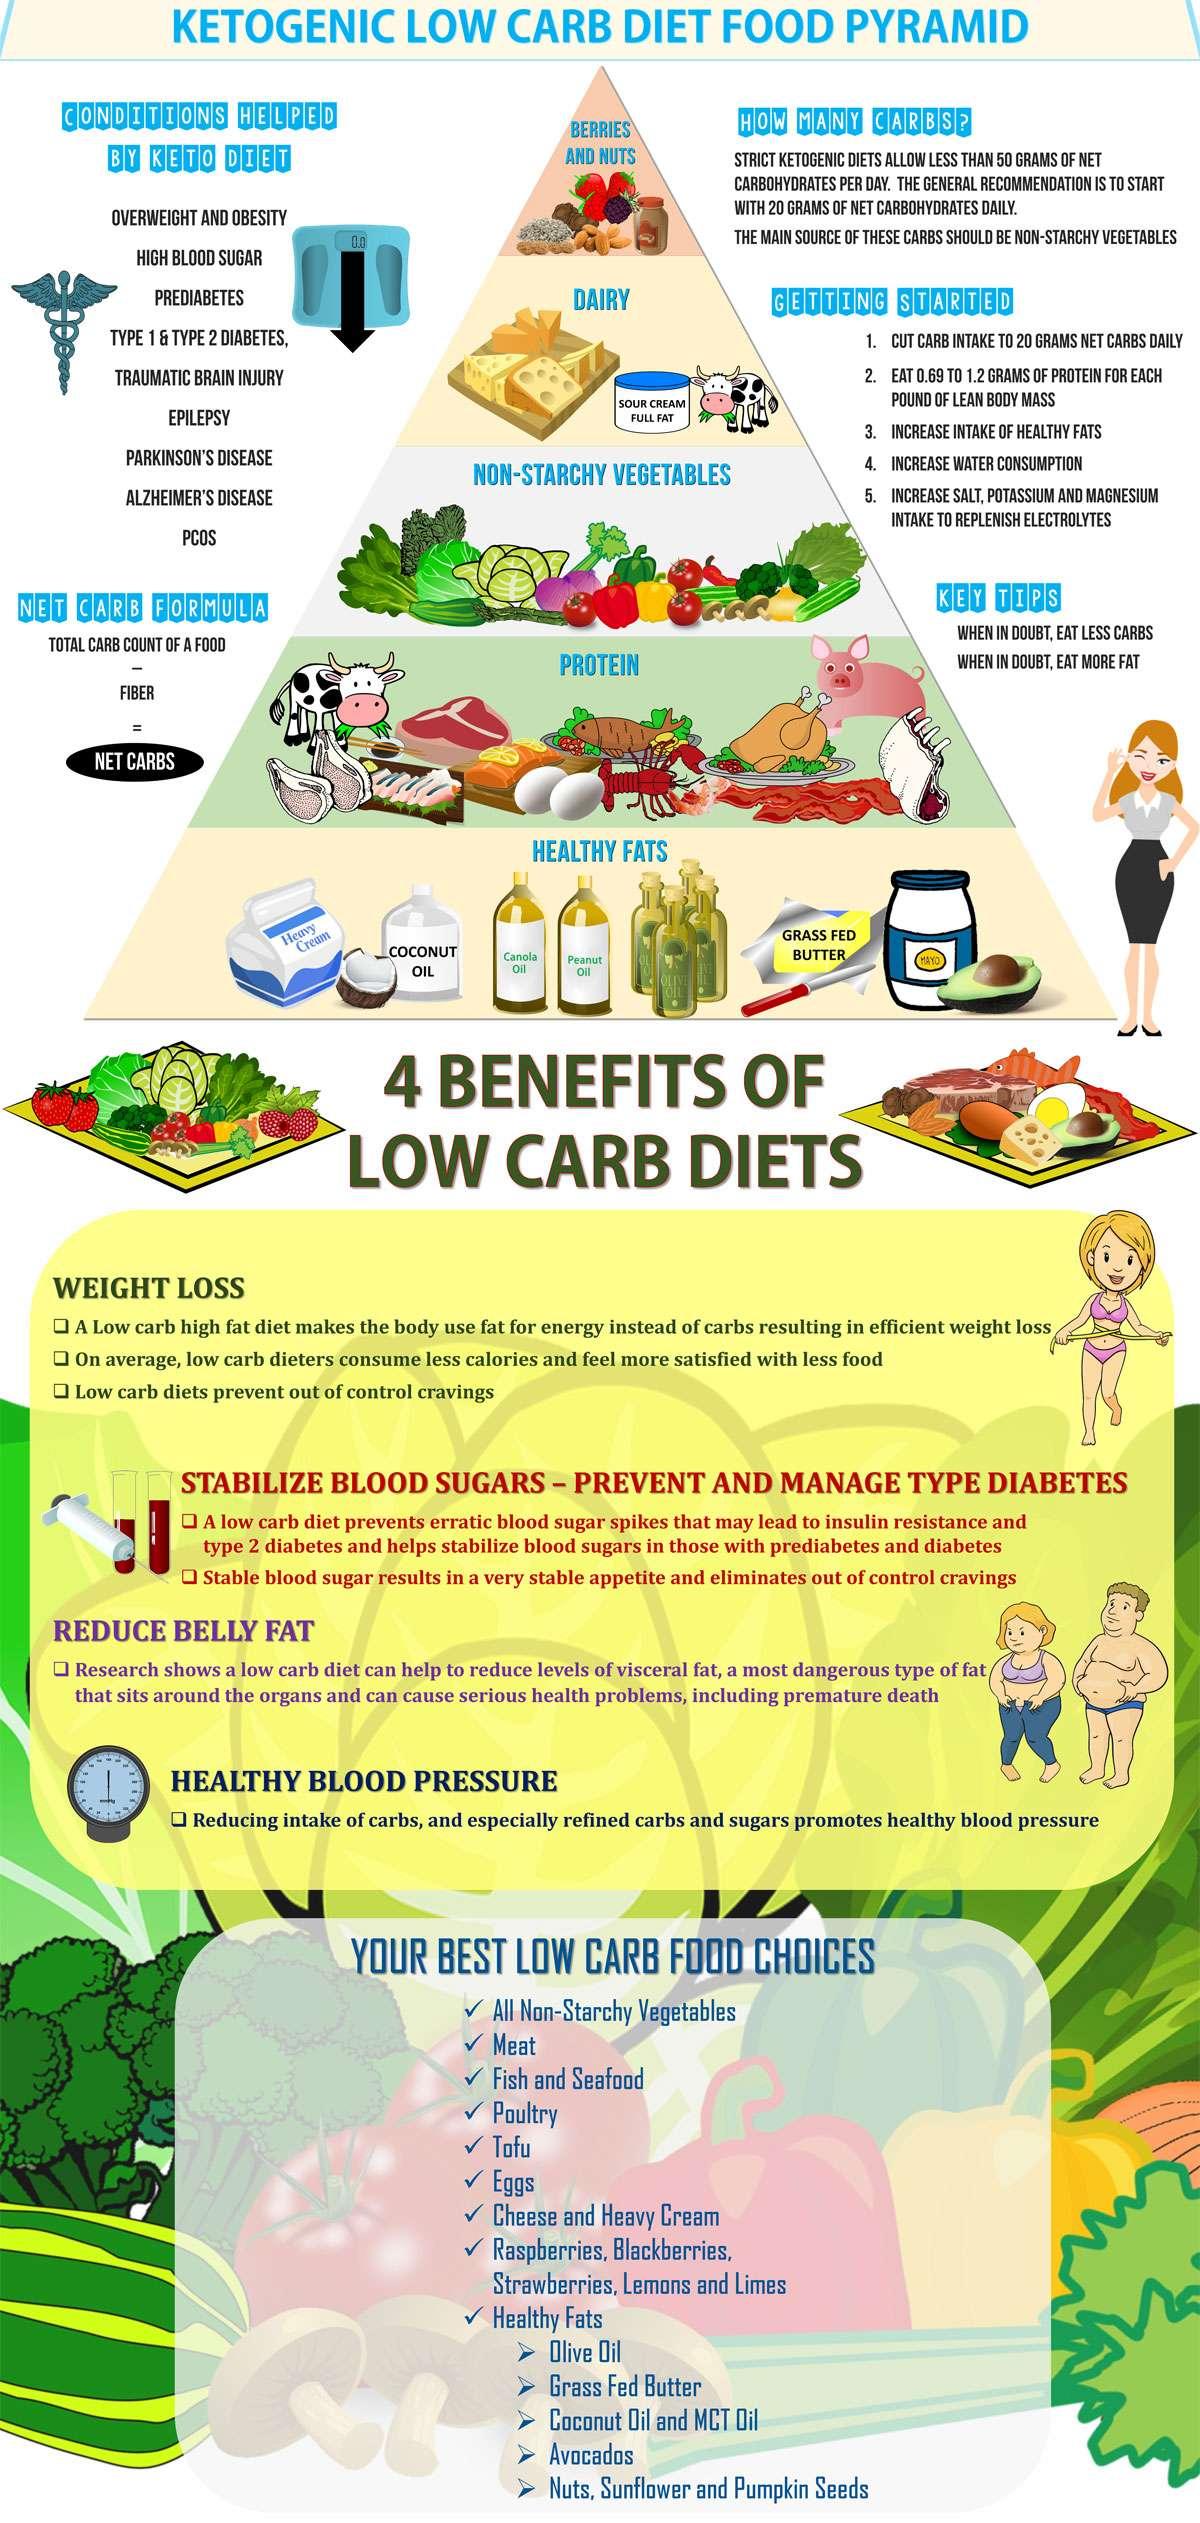 keto-diet-meal-plan-low-carb-diet